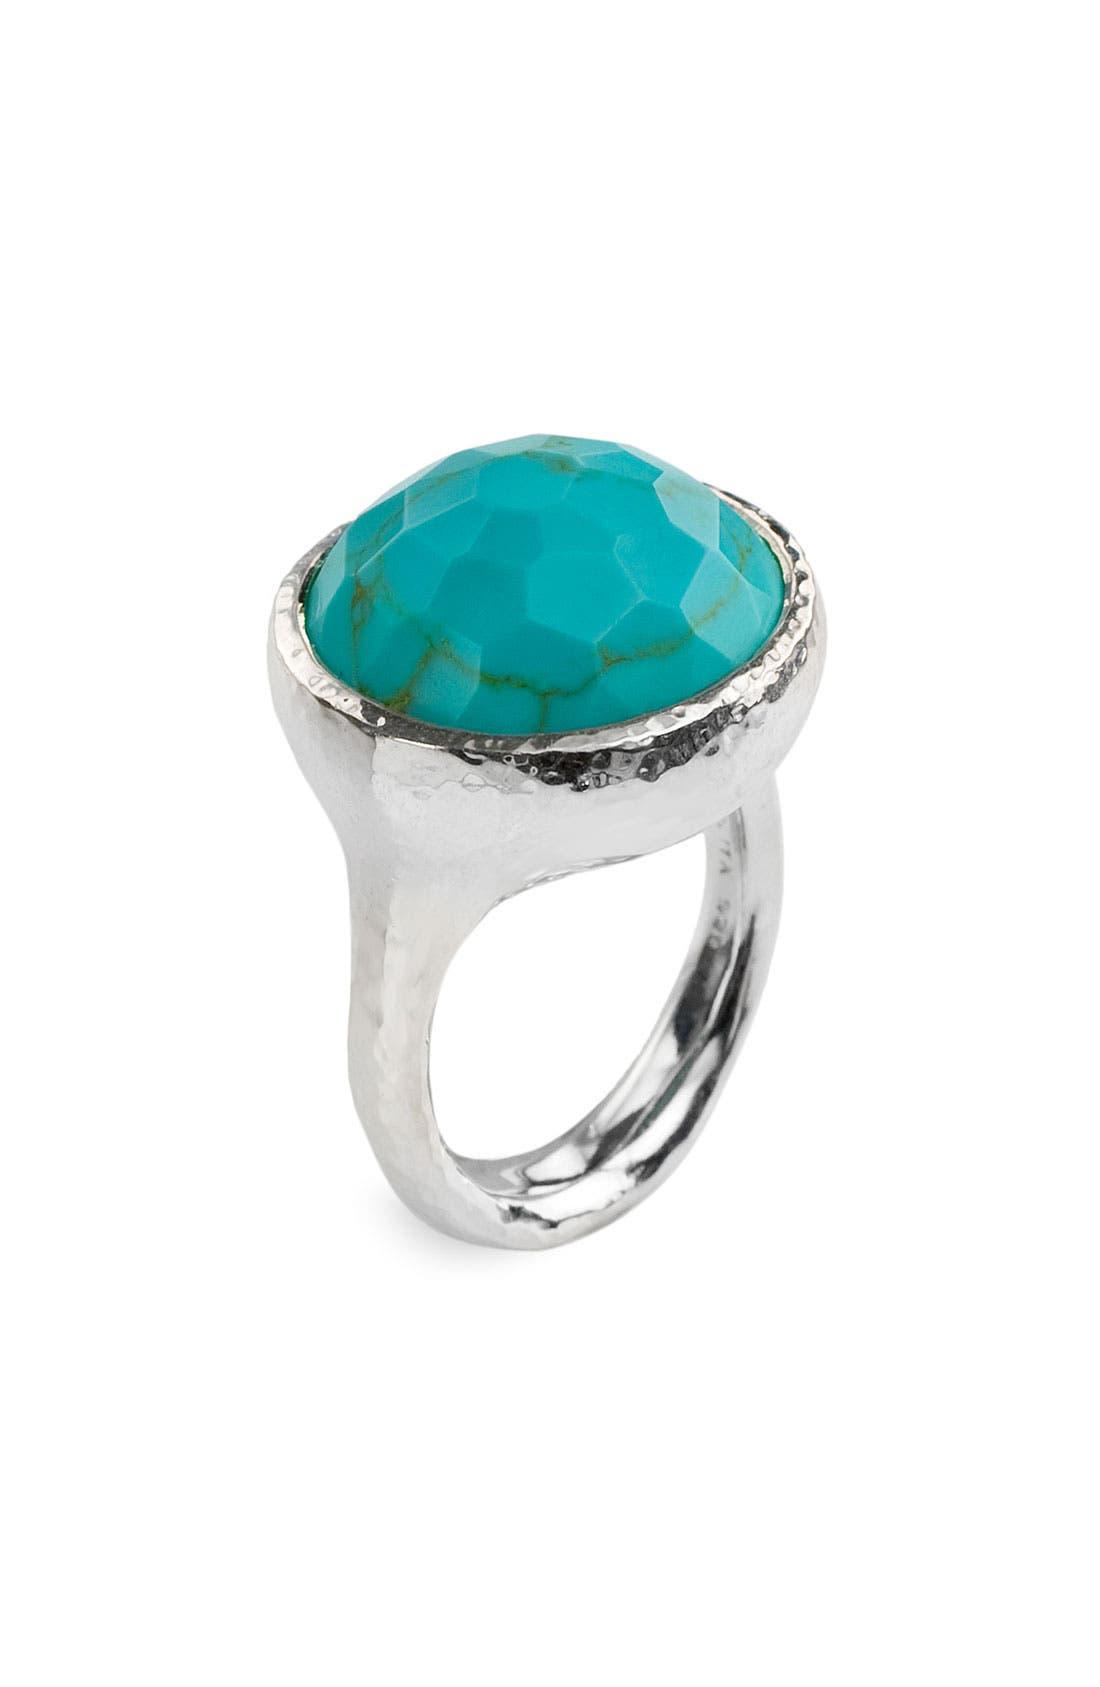 Alternate Image 1 Selected - Ippolita 'Rock Candy Lollipop' Sterling Silver Ring